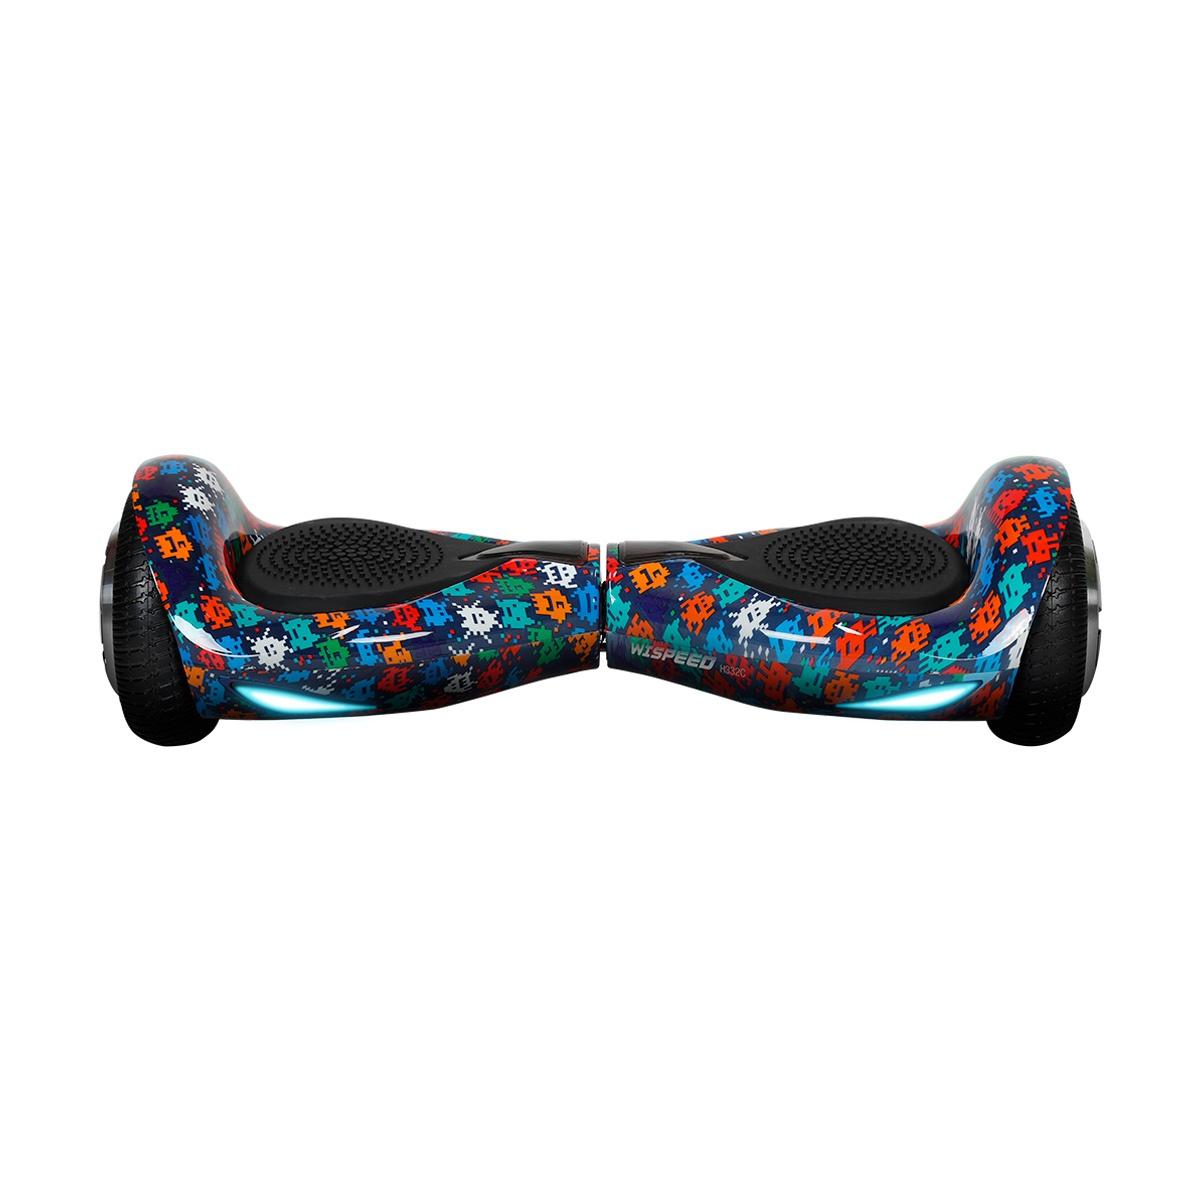 Hoverboard H332c Pixel Art